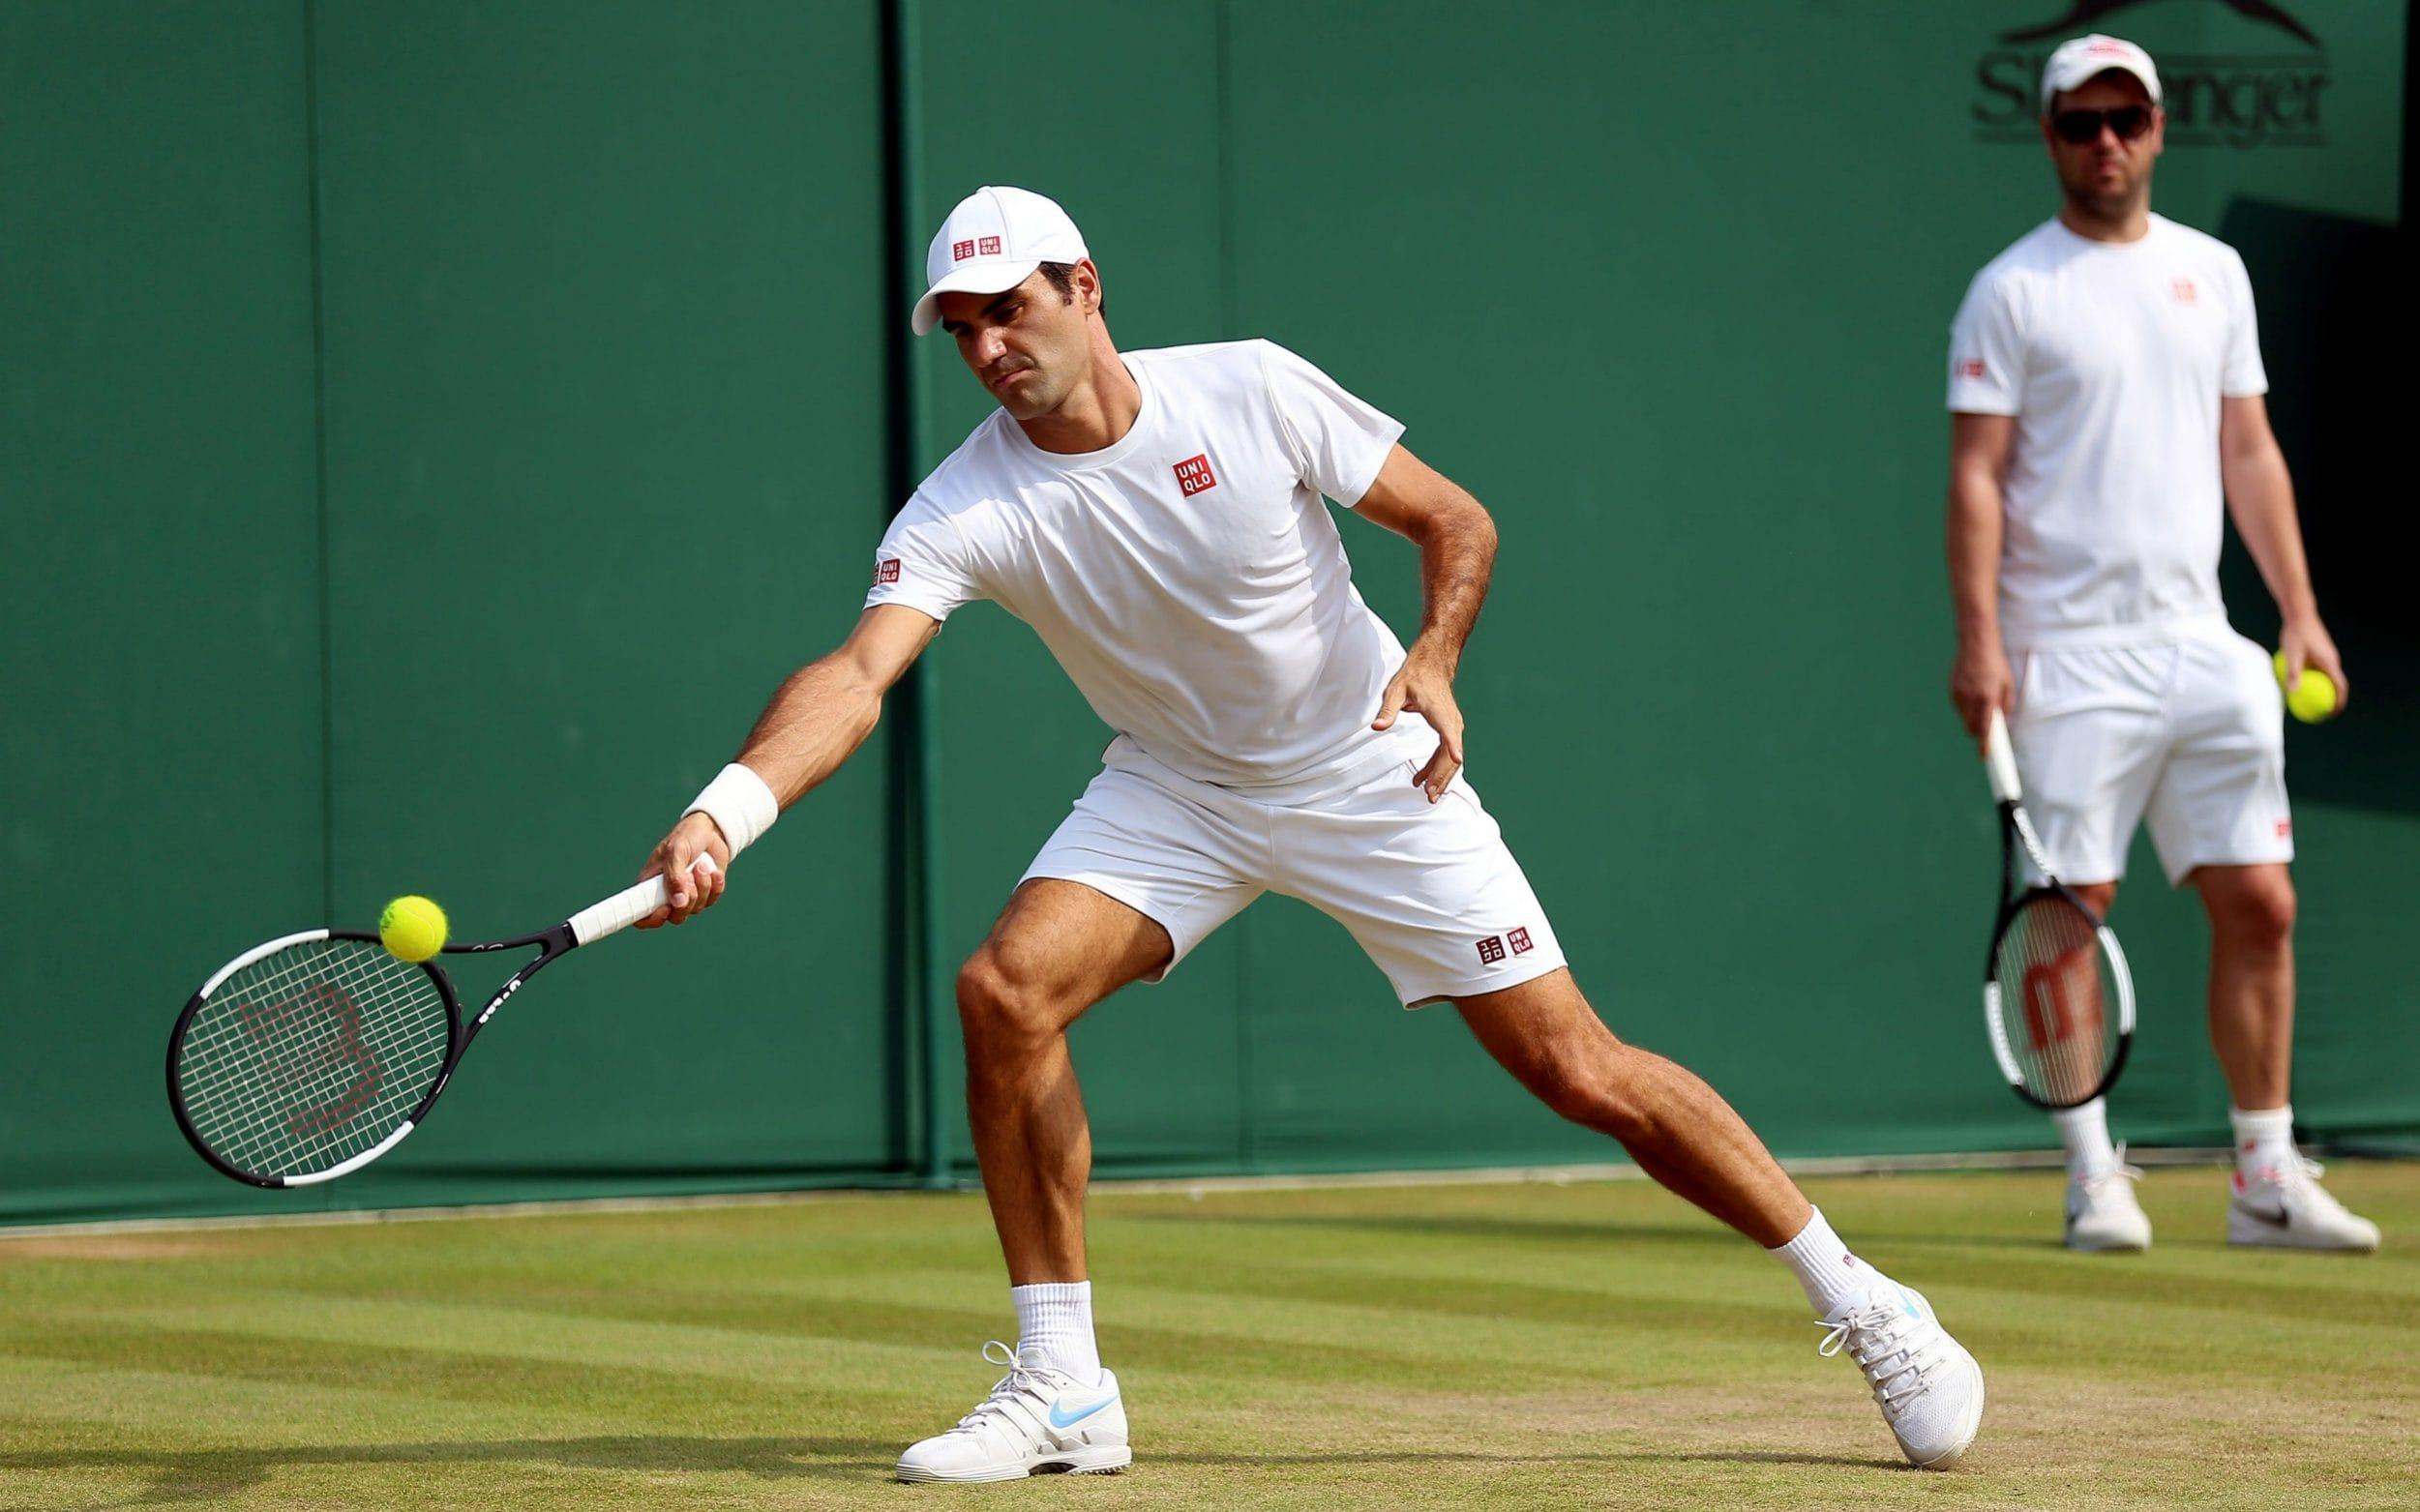 Roger Federer vs Adrian Mannarino, Wimbledon 2018 live score